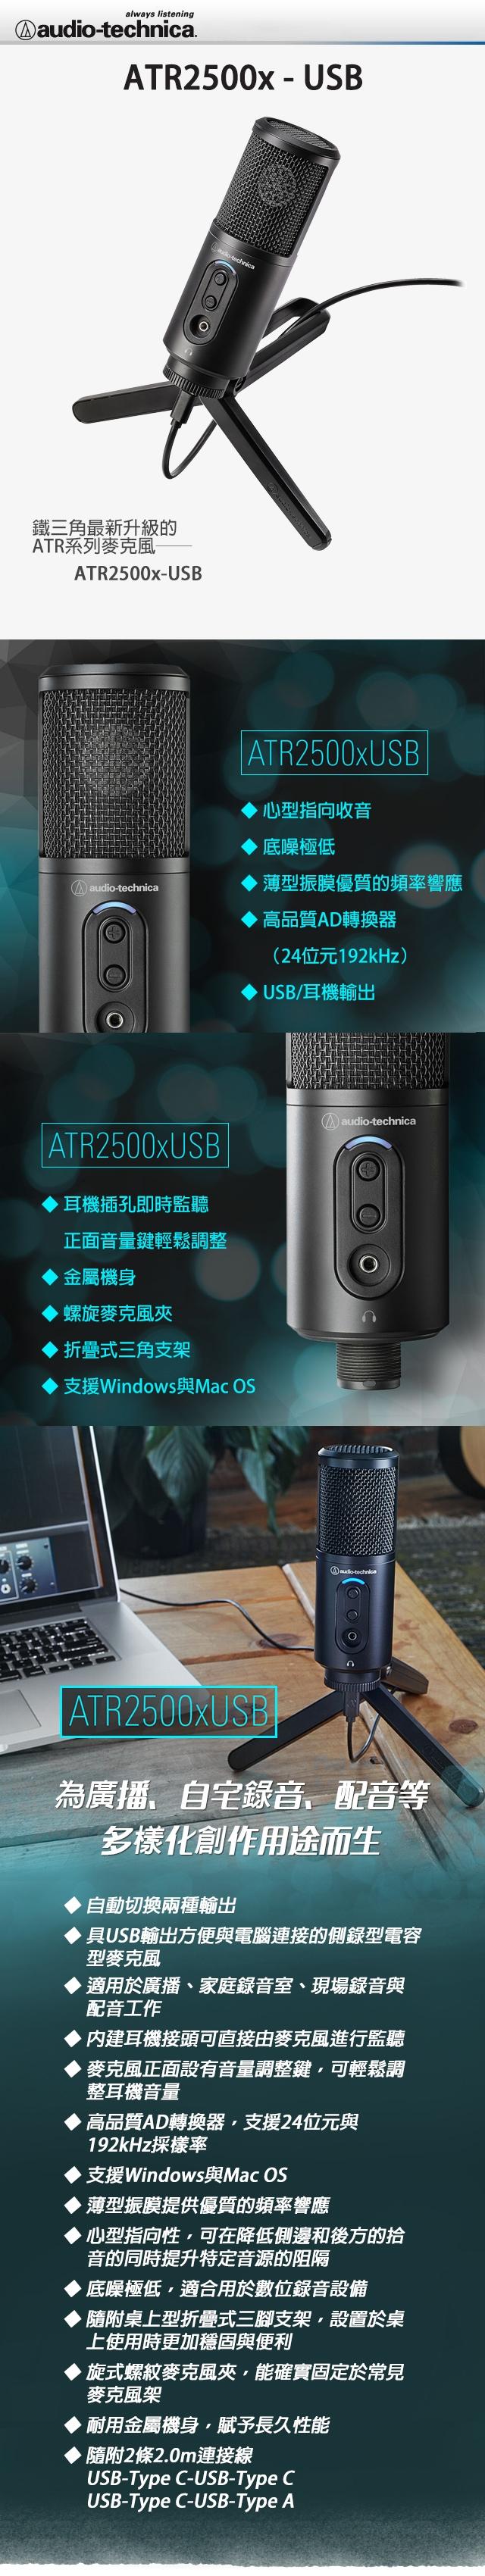 audio-technica 心型指向性電容型USB麥克風 ATR2500XUSB